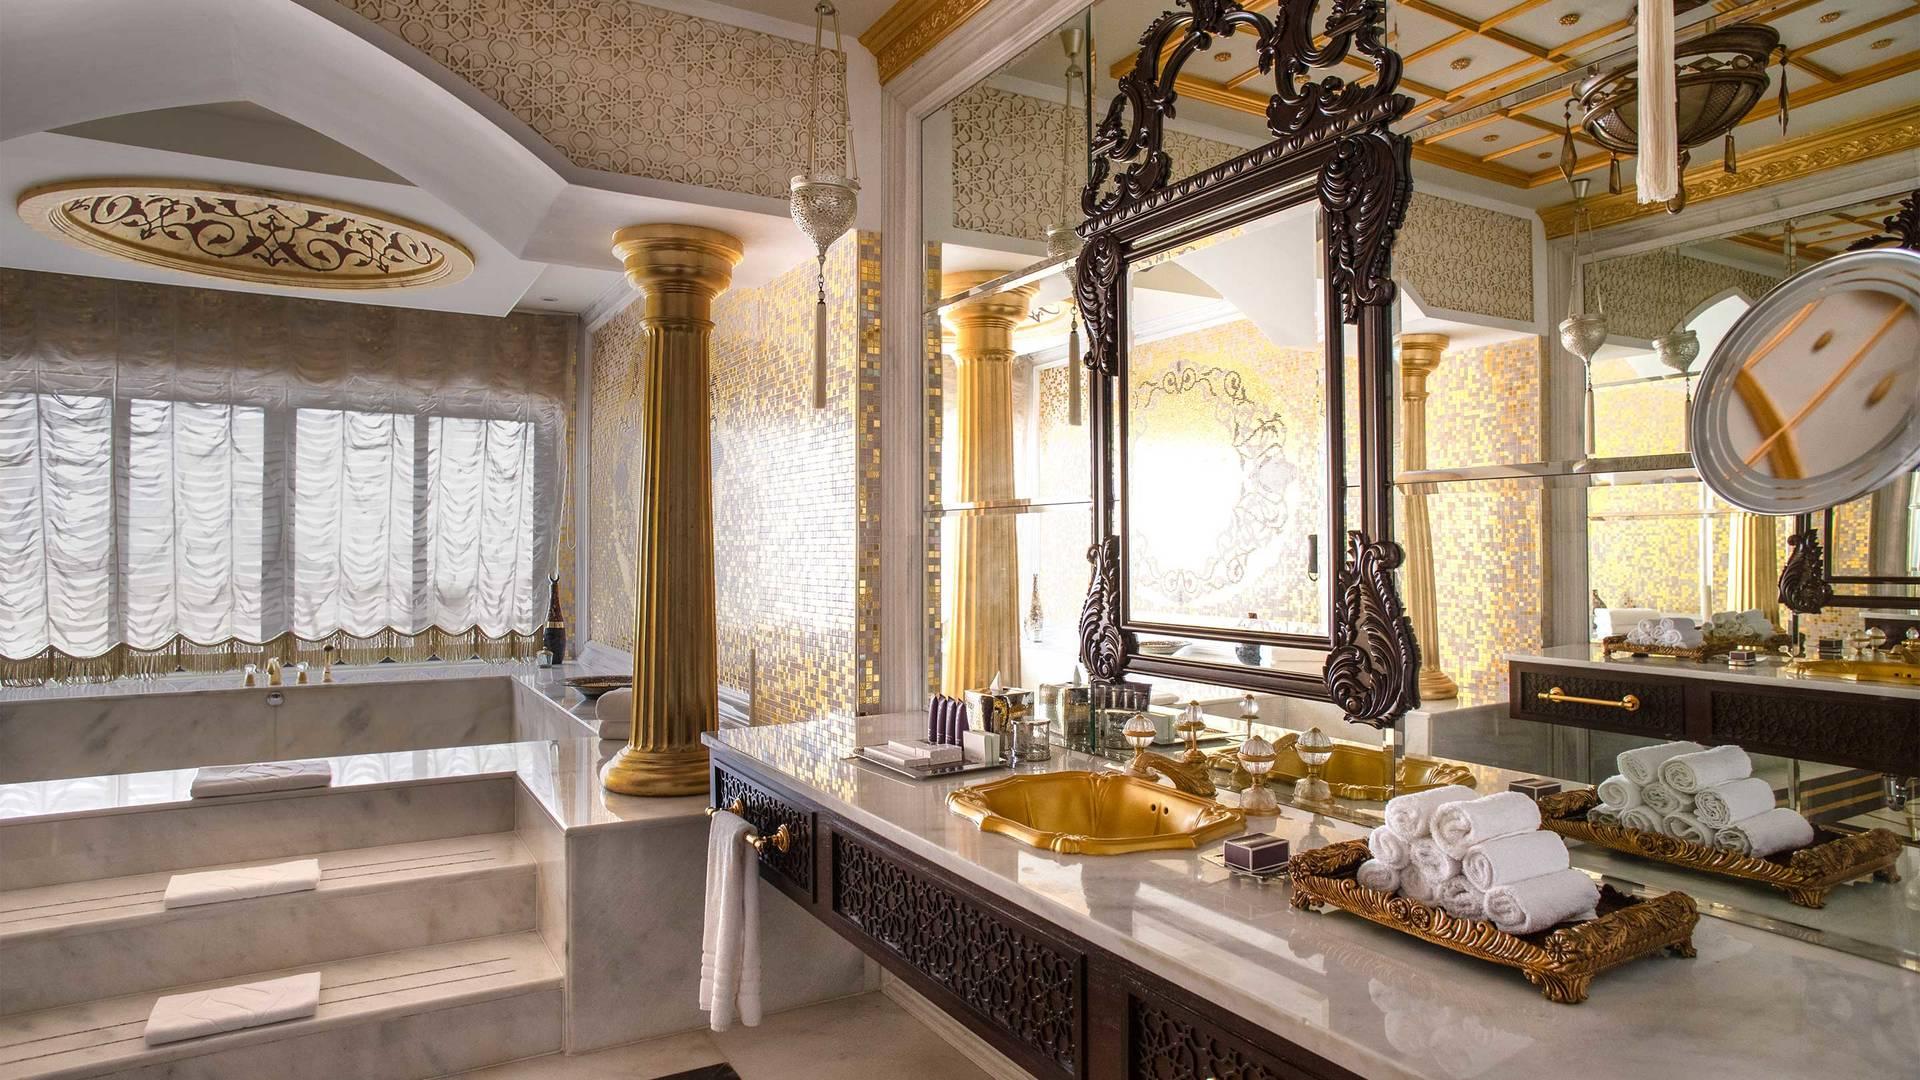 16-9_Jumeirah-Zabeel-Saray---Grand-Imperial-Suite---Bathroom-Area-Details